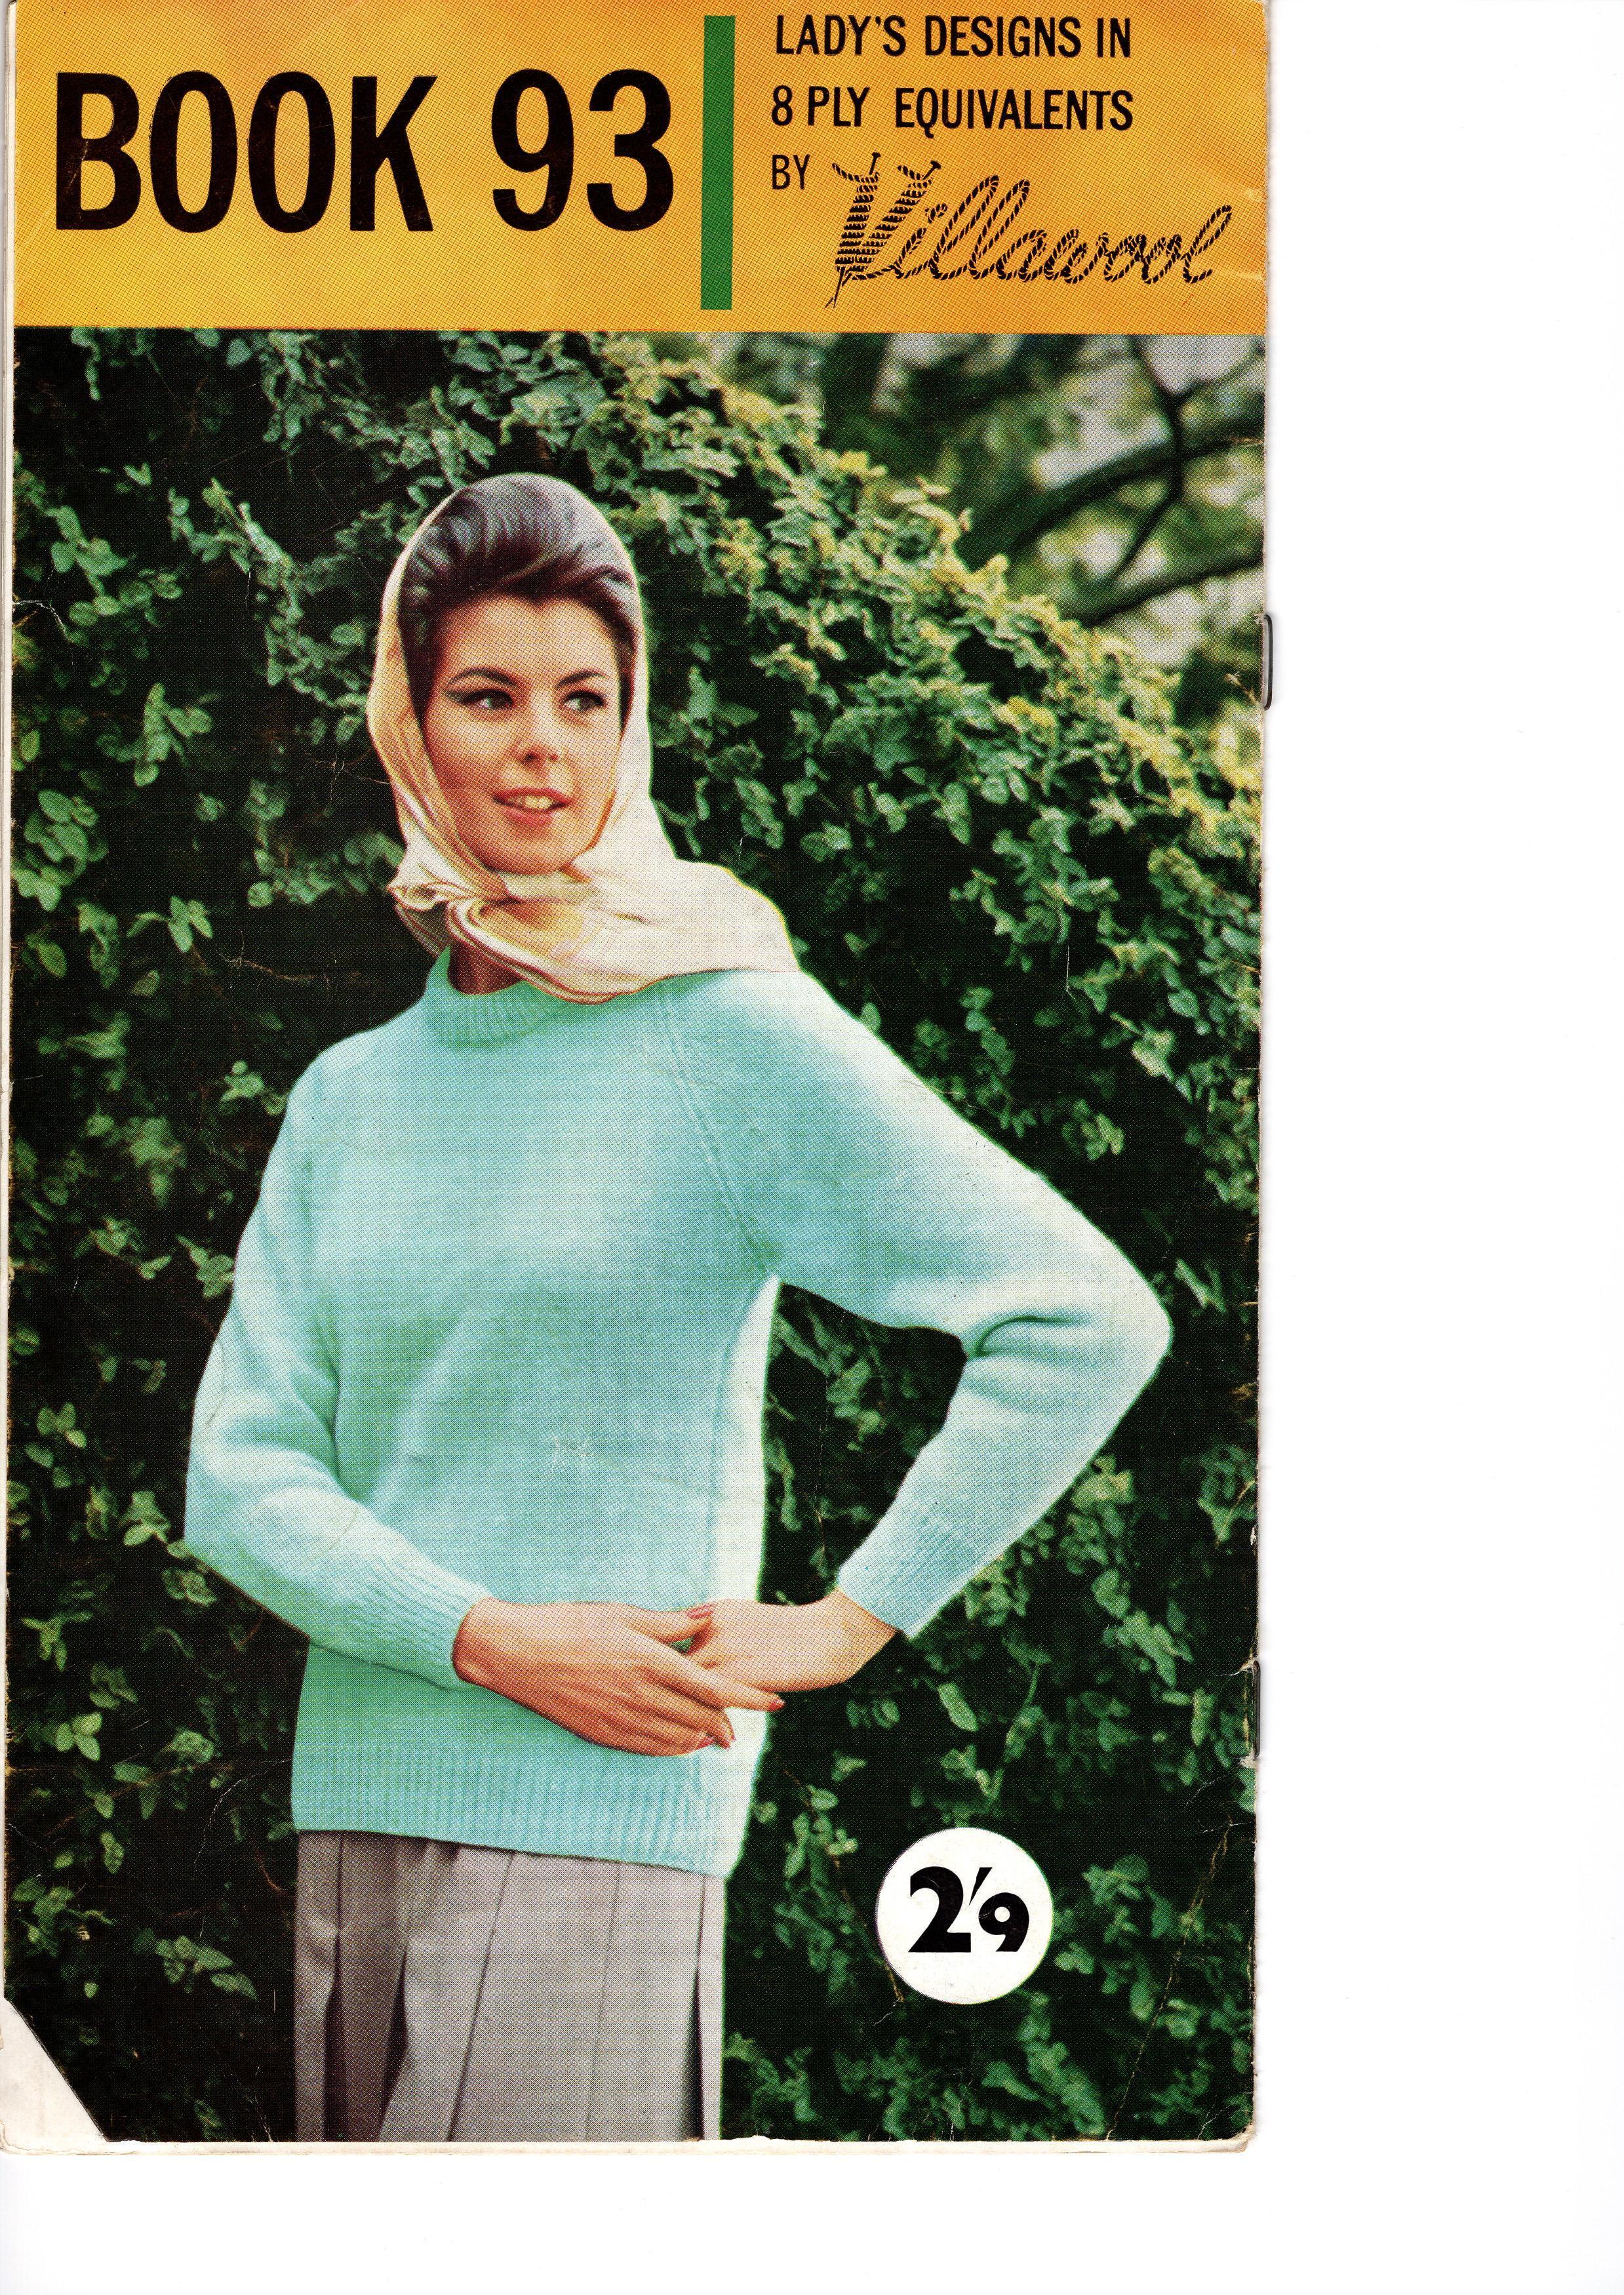 Villawool Knitting Pattern Booklet No.93